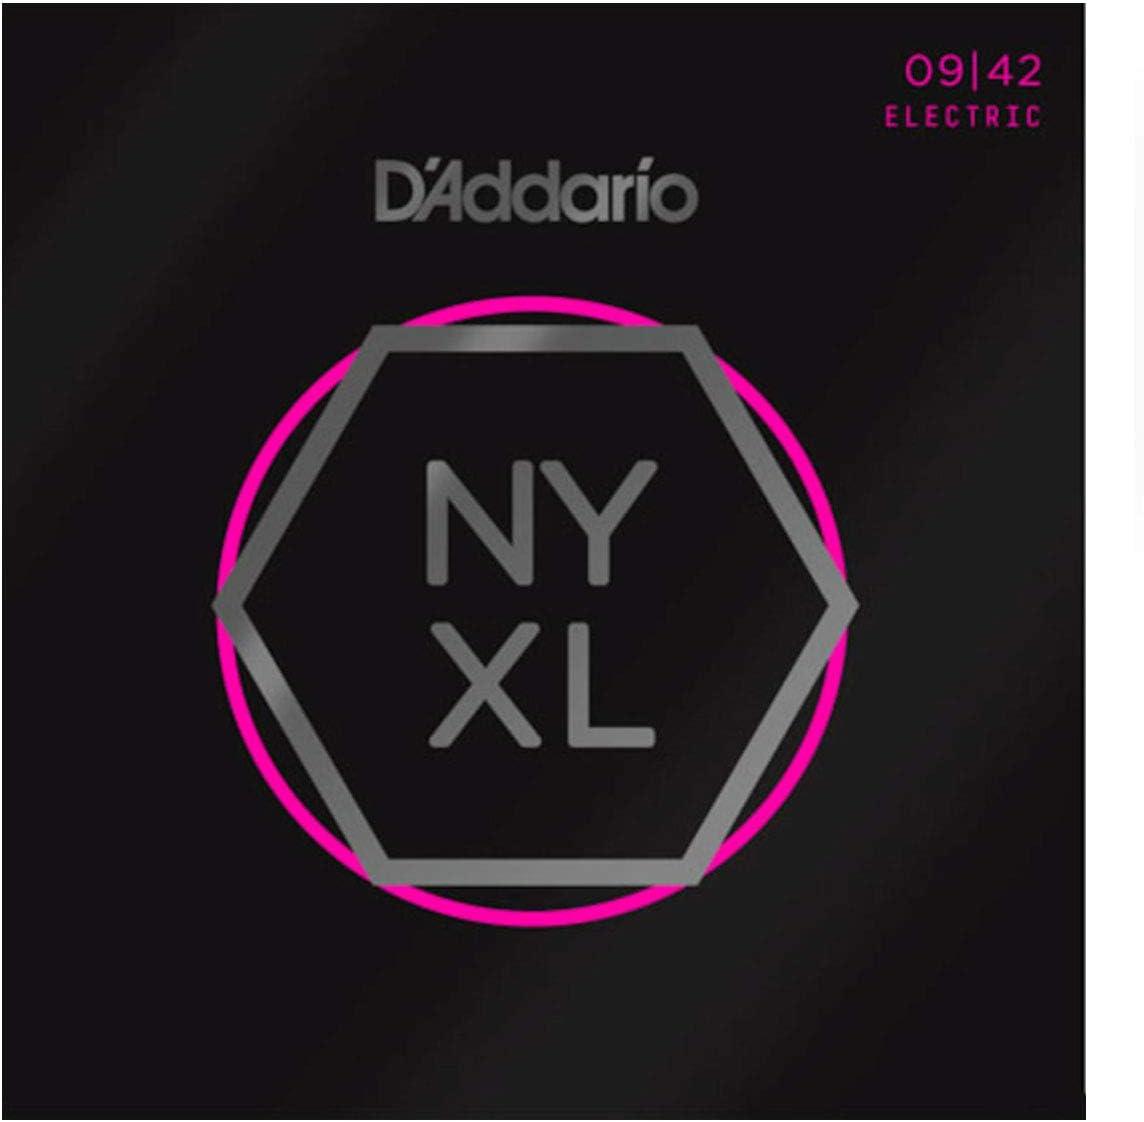 D'Addario NYXL0942 Super Light 9-42 - Cuerdas para guitarra eléctrica (níquel)